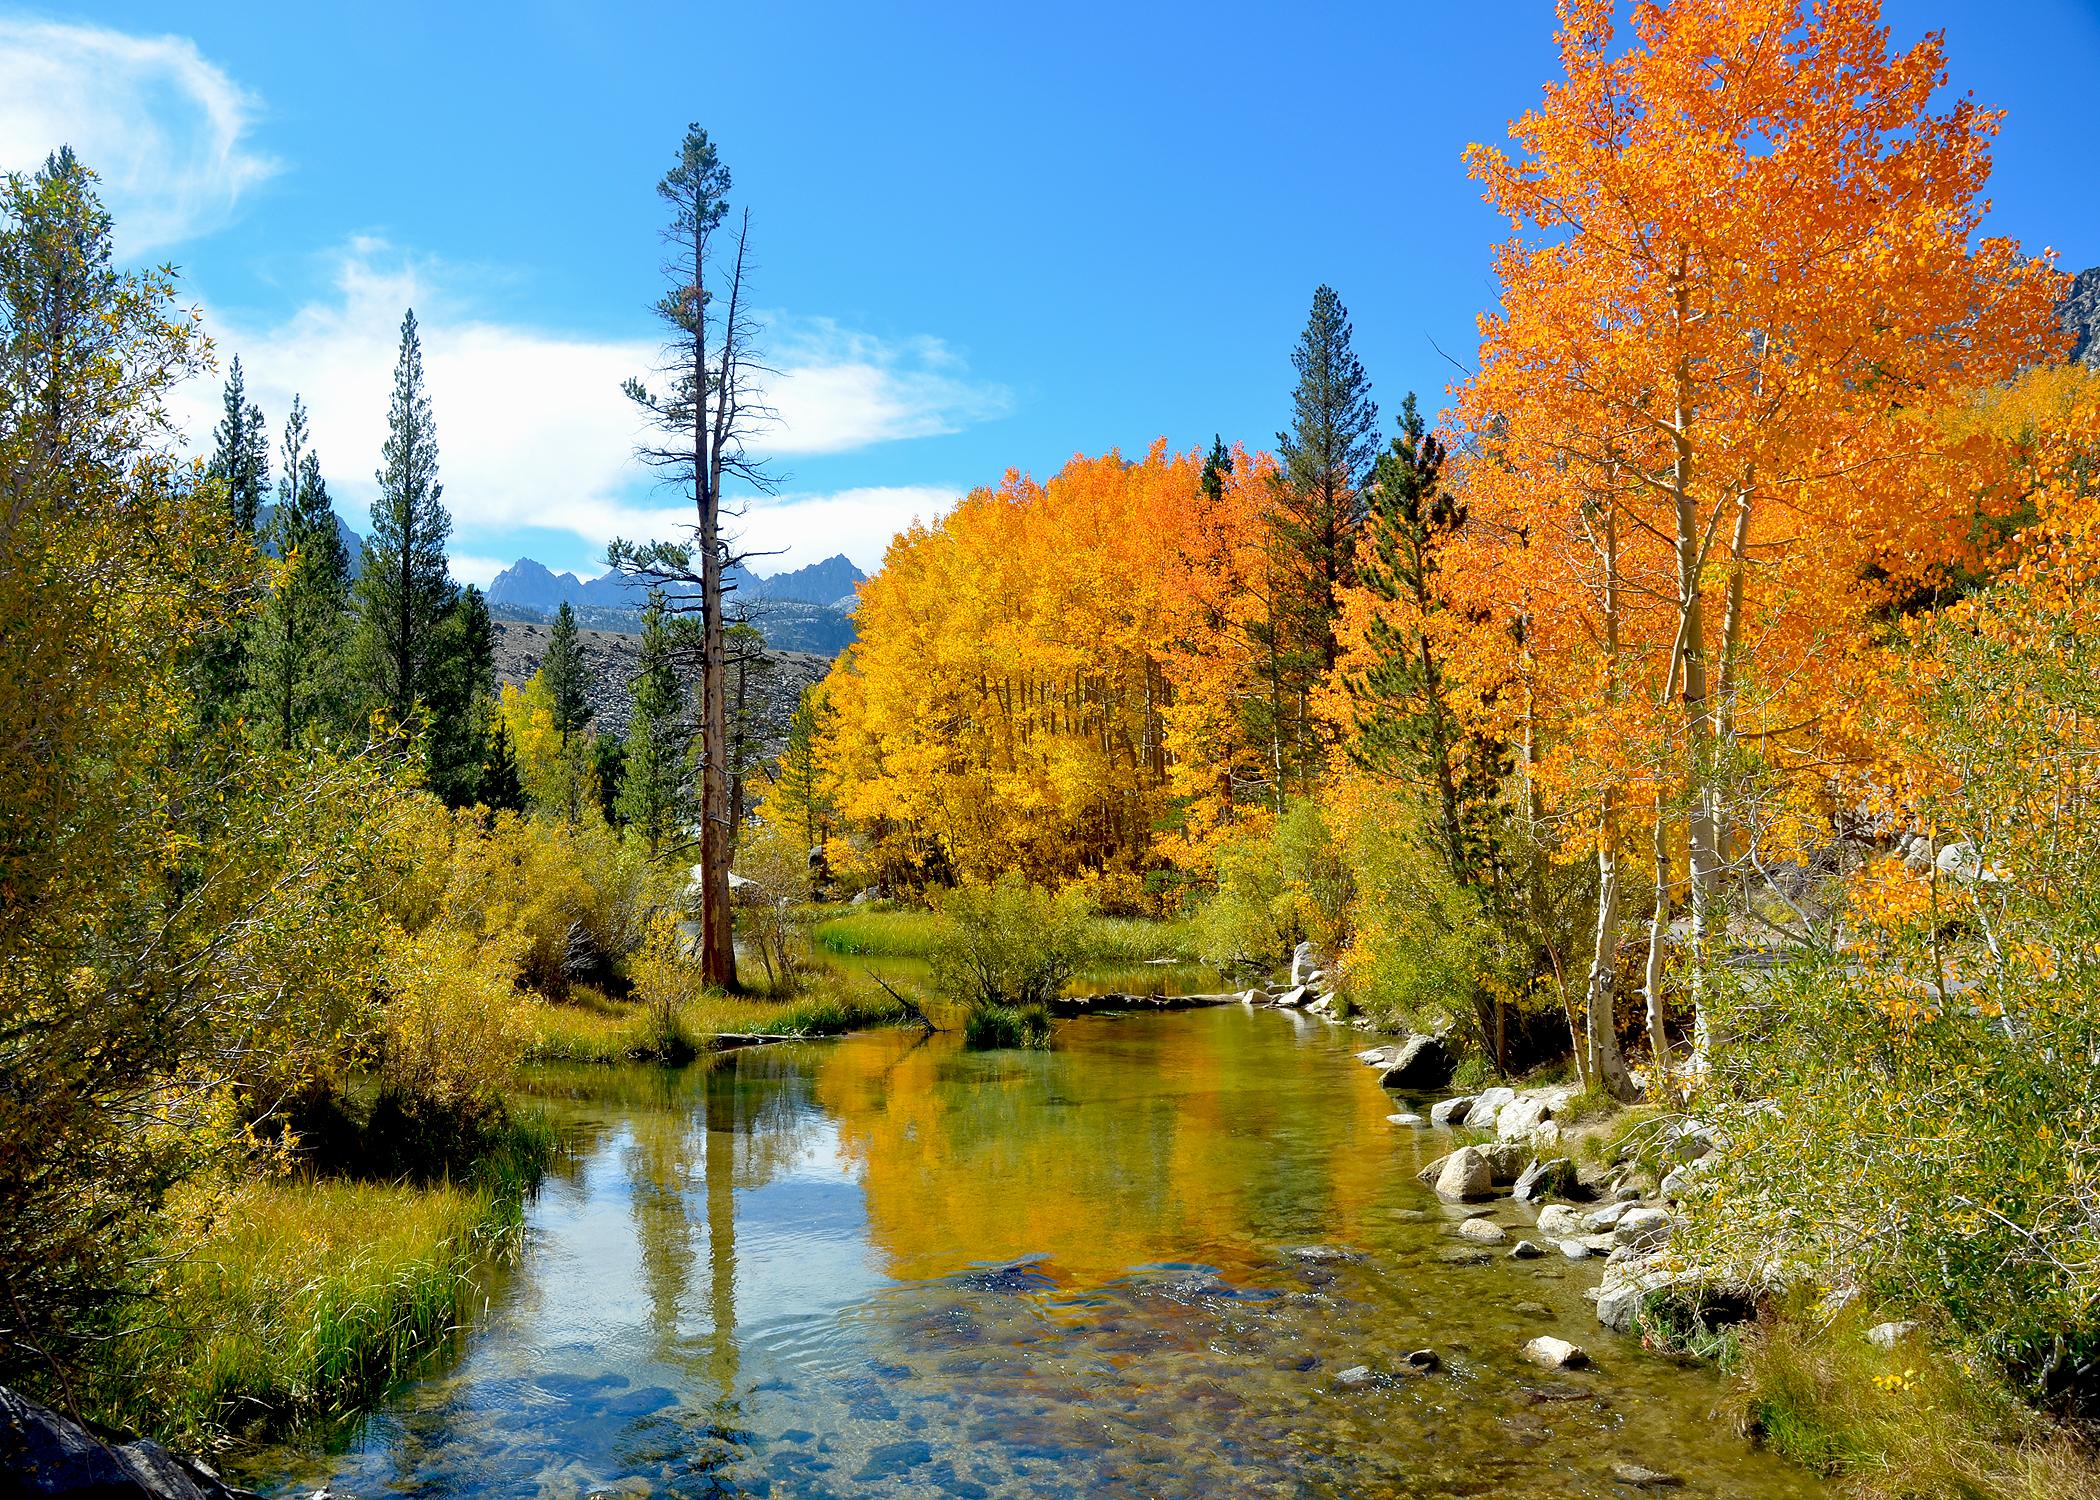 Waterfalls Live Wallpaper 3d Hd Eastern Sierra At Full Peak Go Now California Fall Color